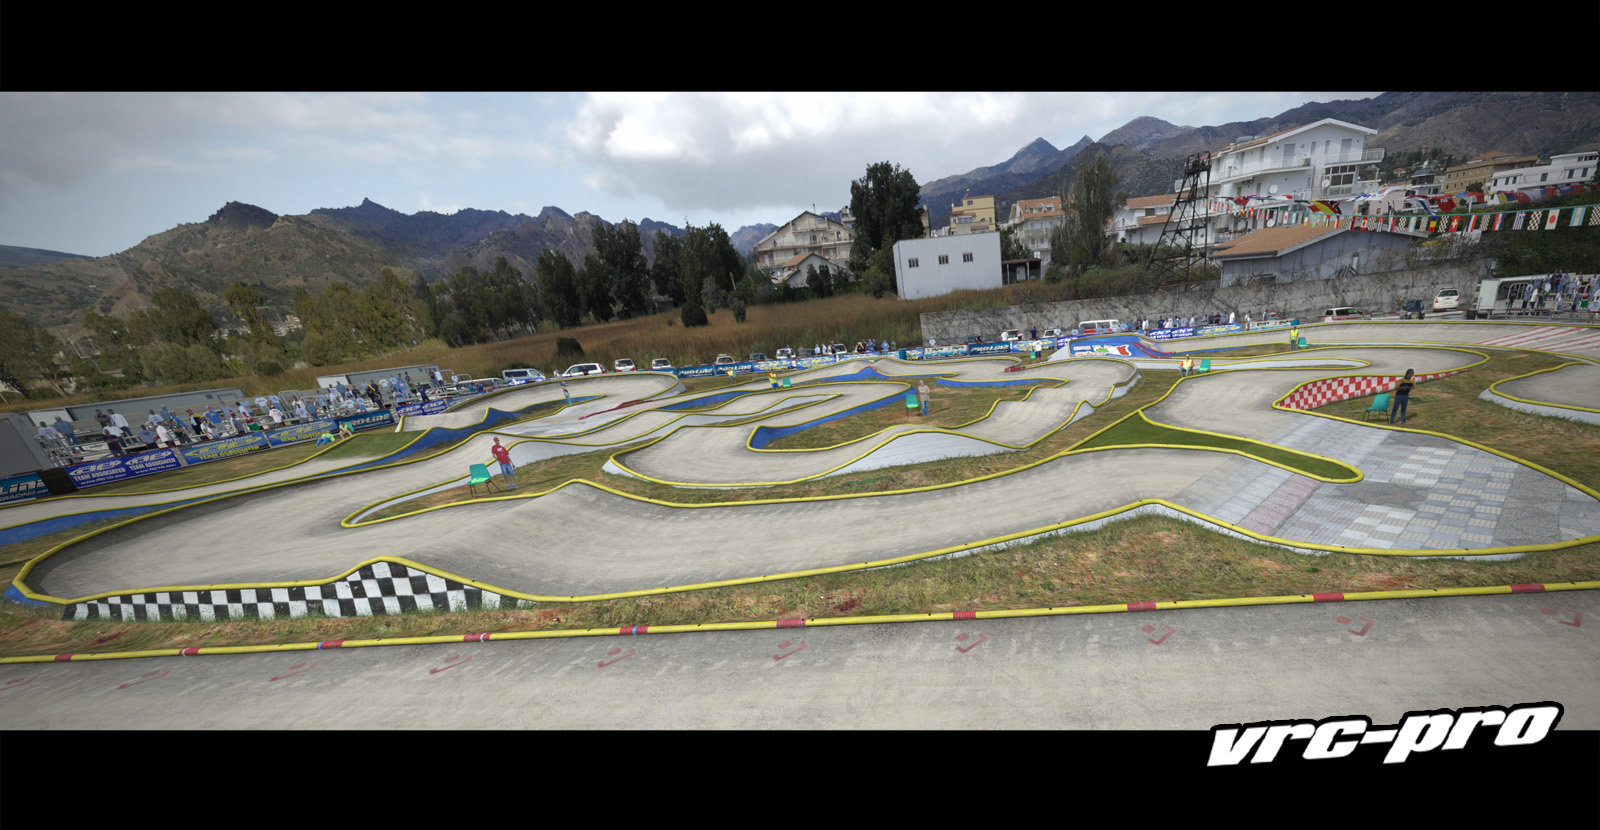 VRC PRO Deluxe Off-road tracks screenshot